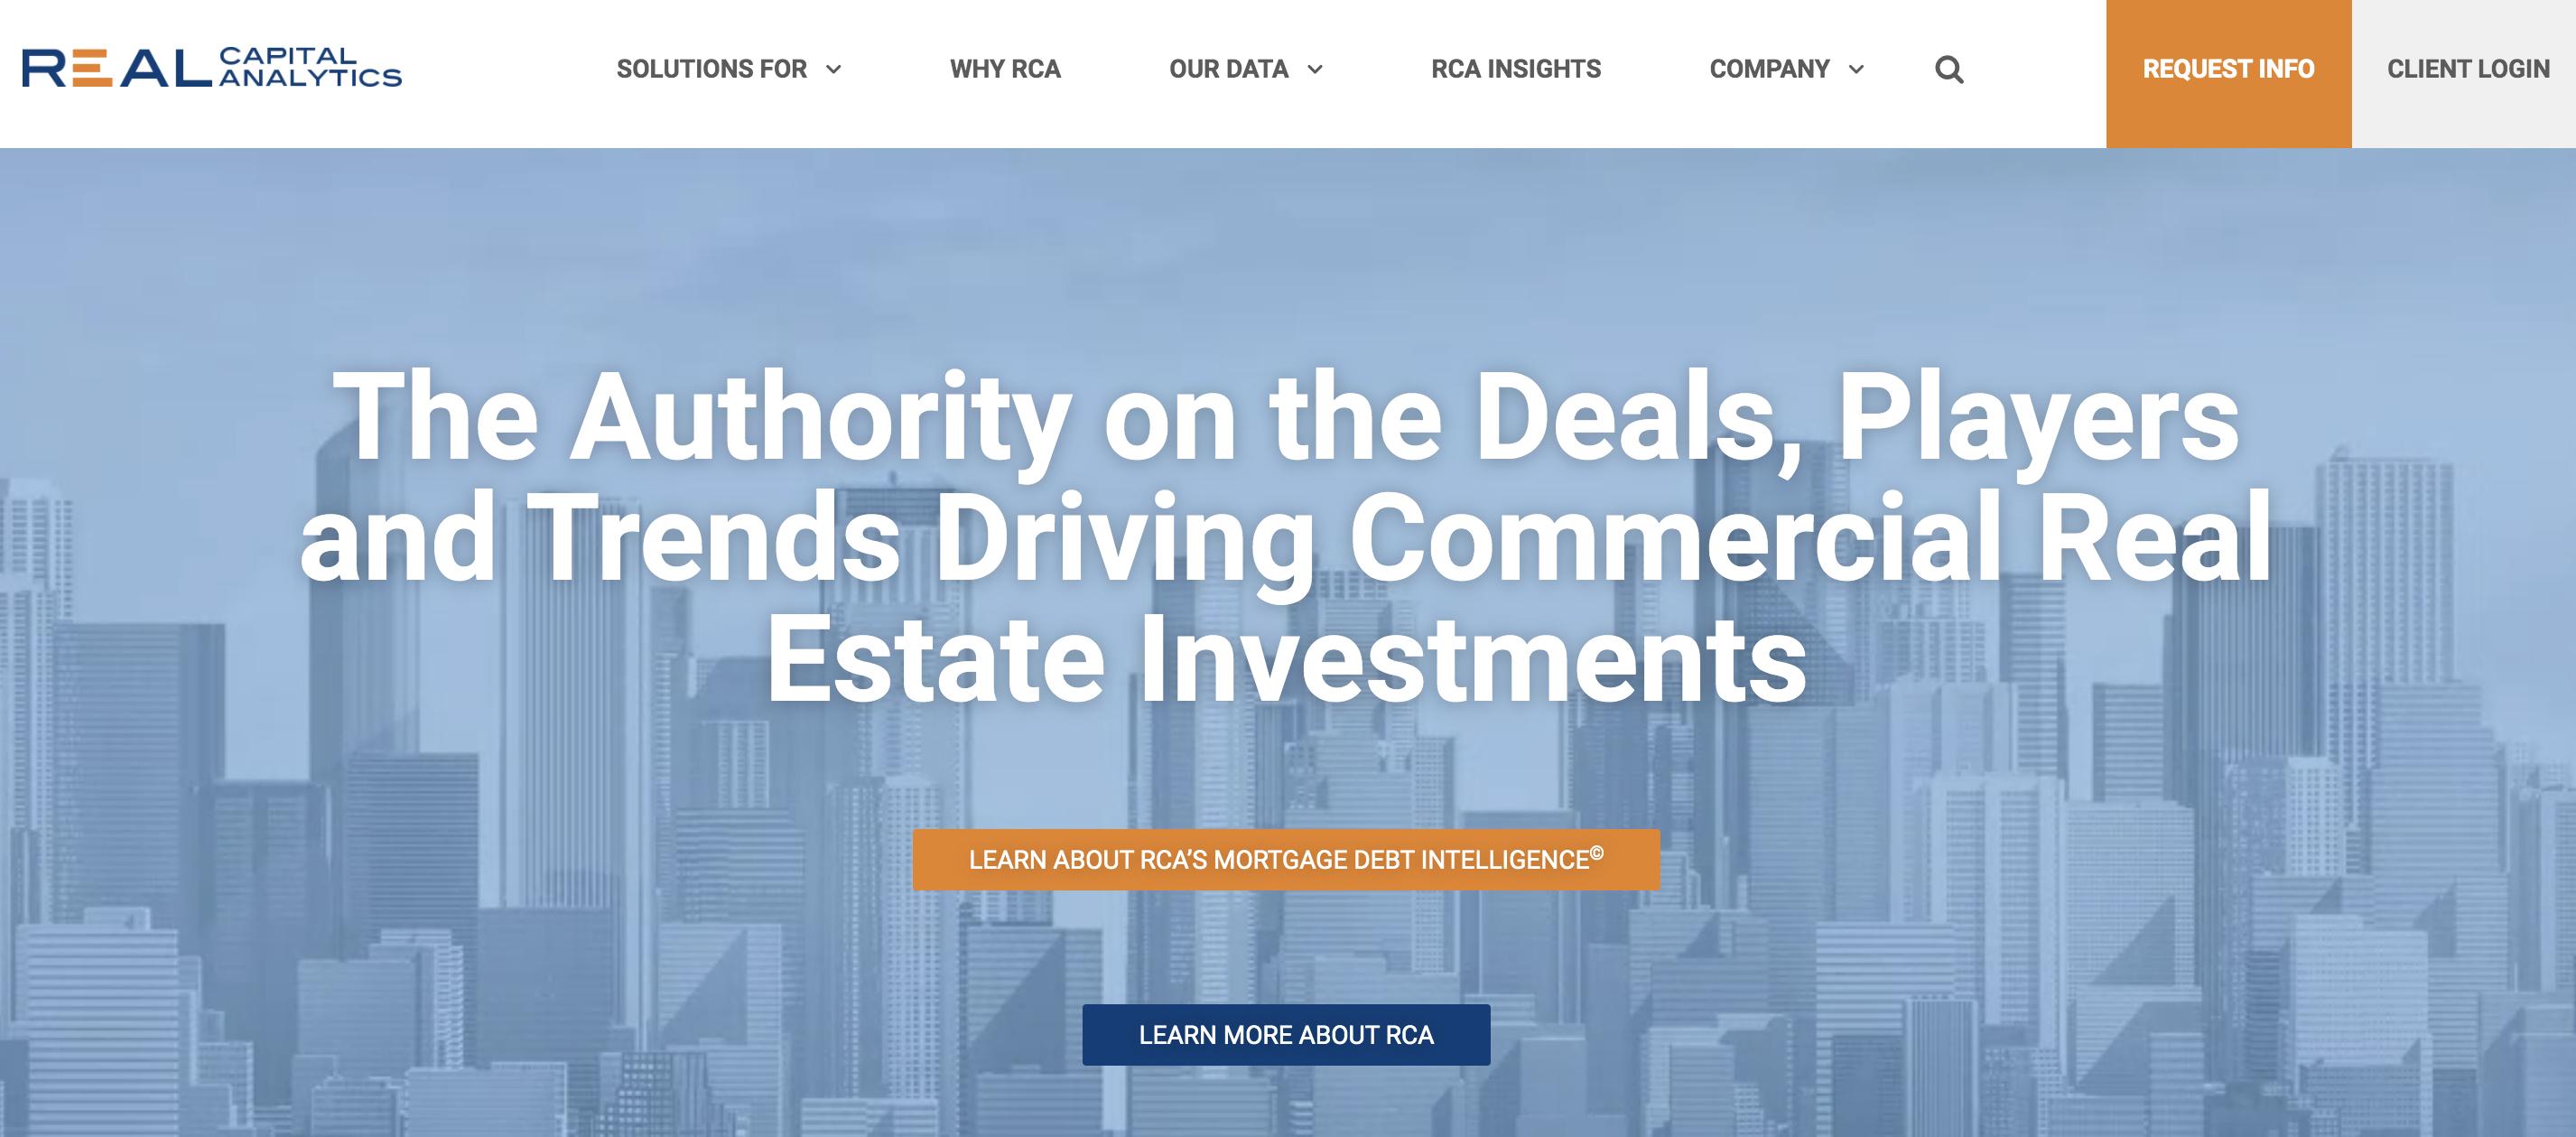 Real_Capital_Analytics